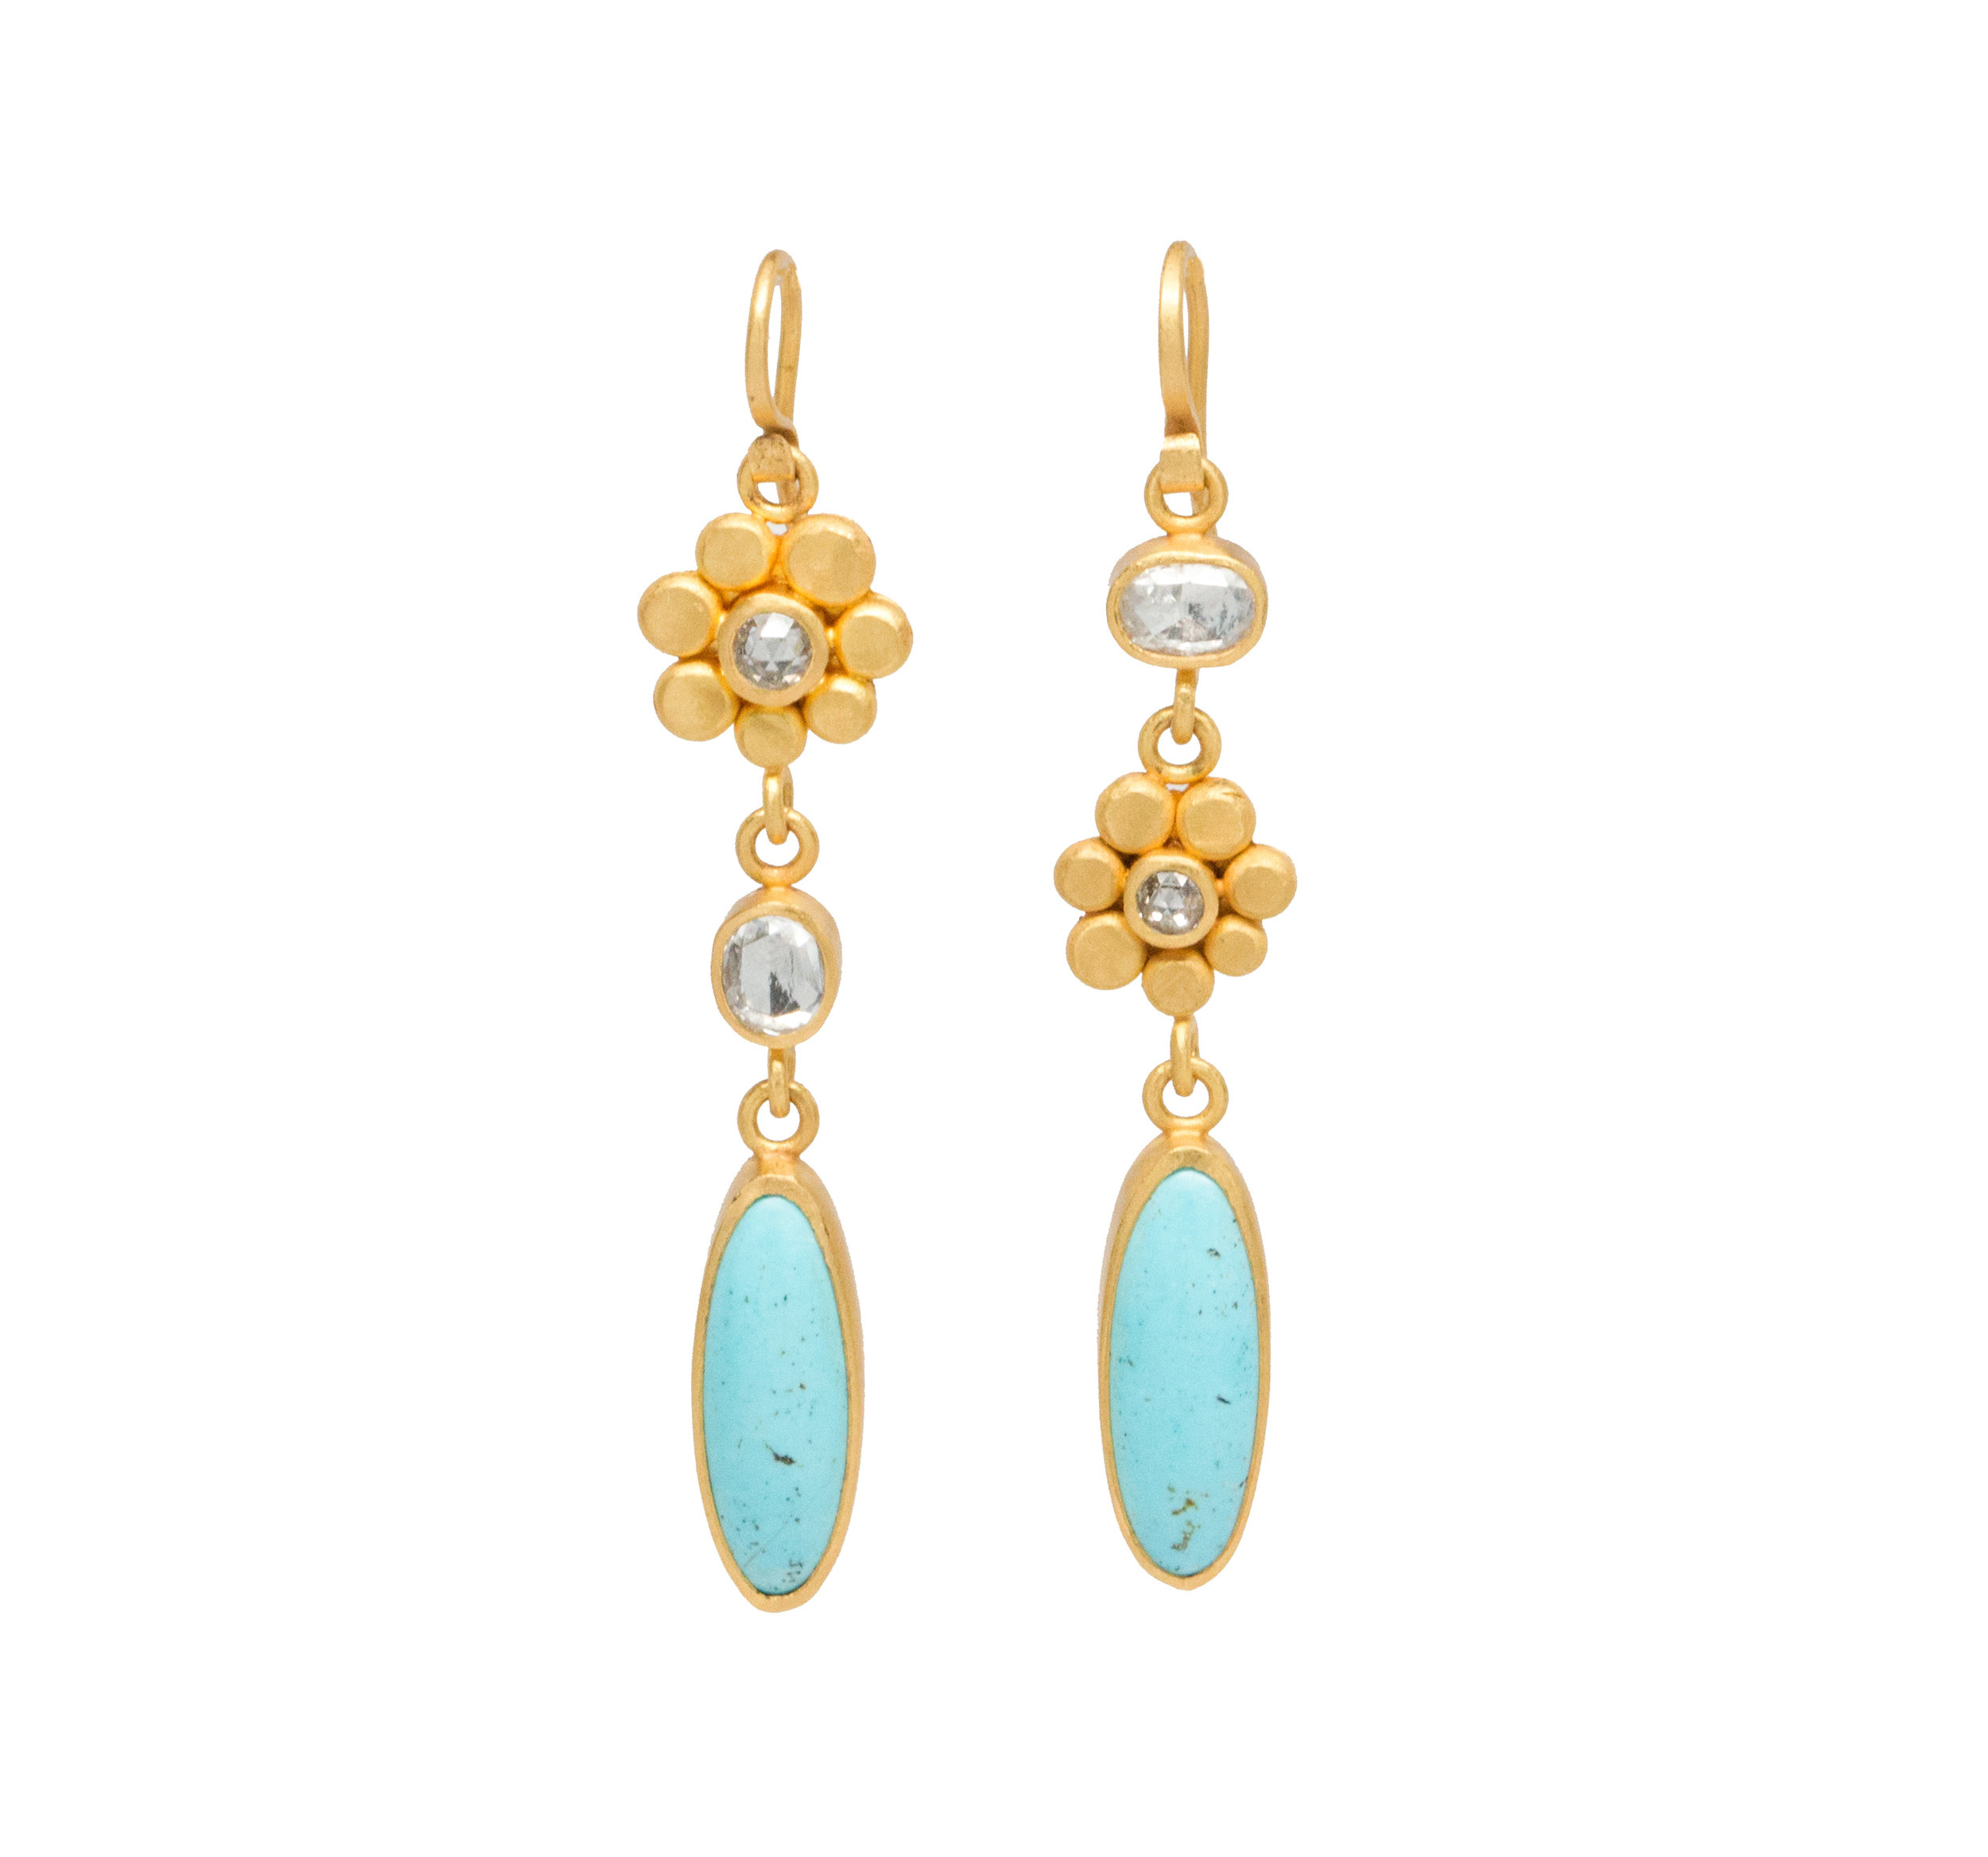 dec19 jewelry2-247.jpg